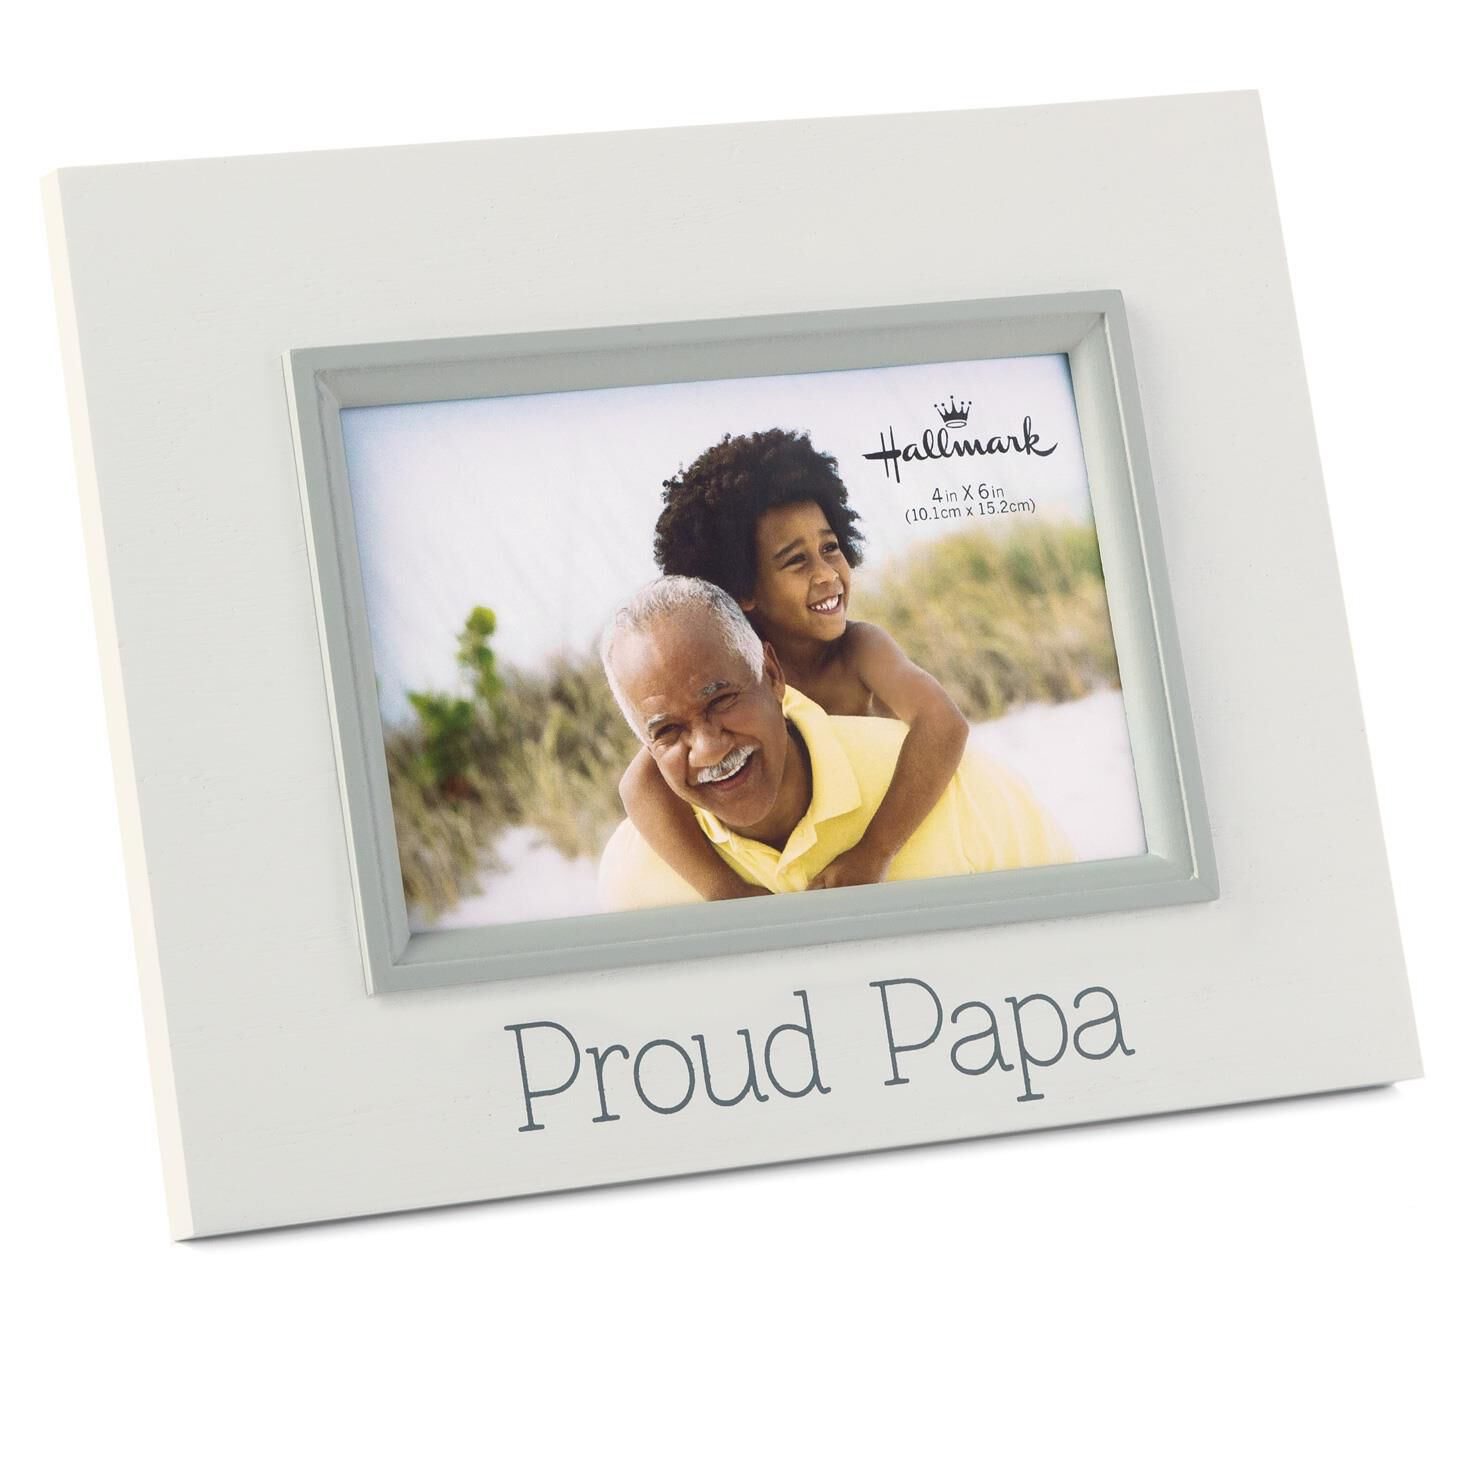 proud papa 4x6 wood malden frame picture frames hallmark